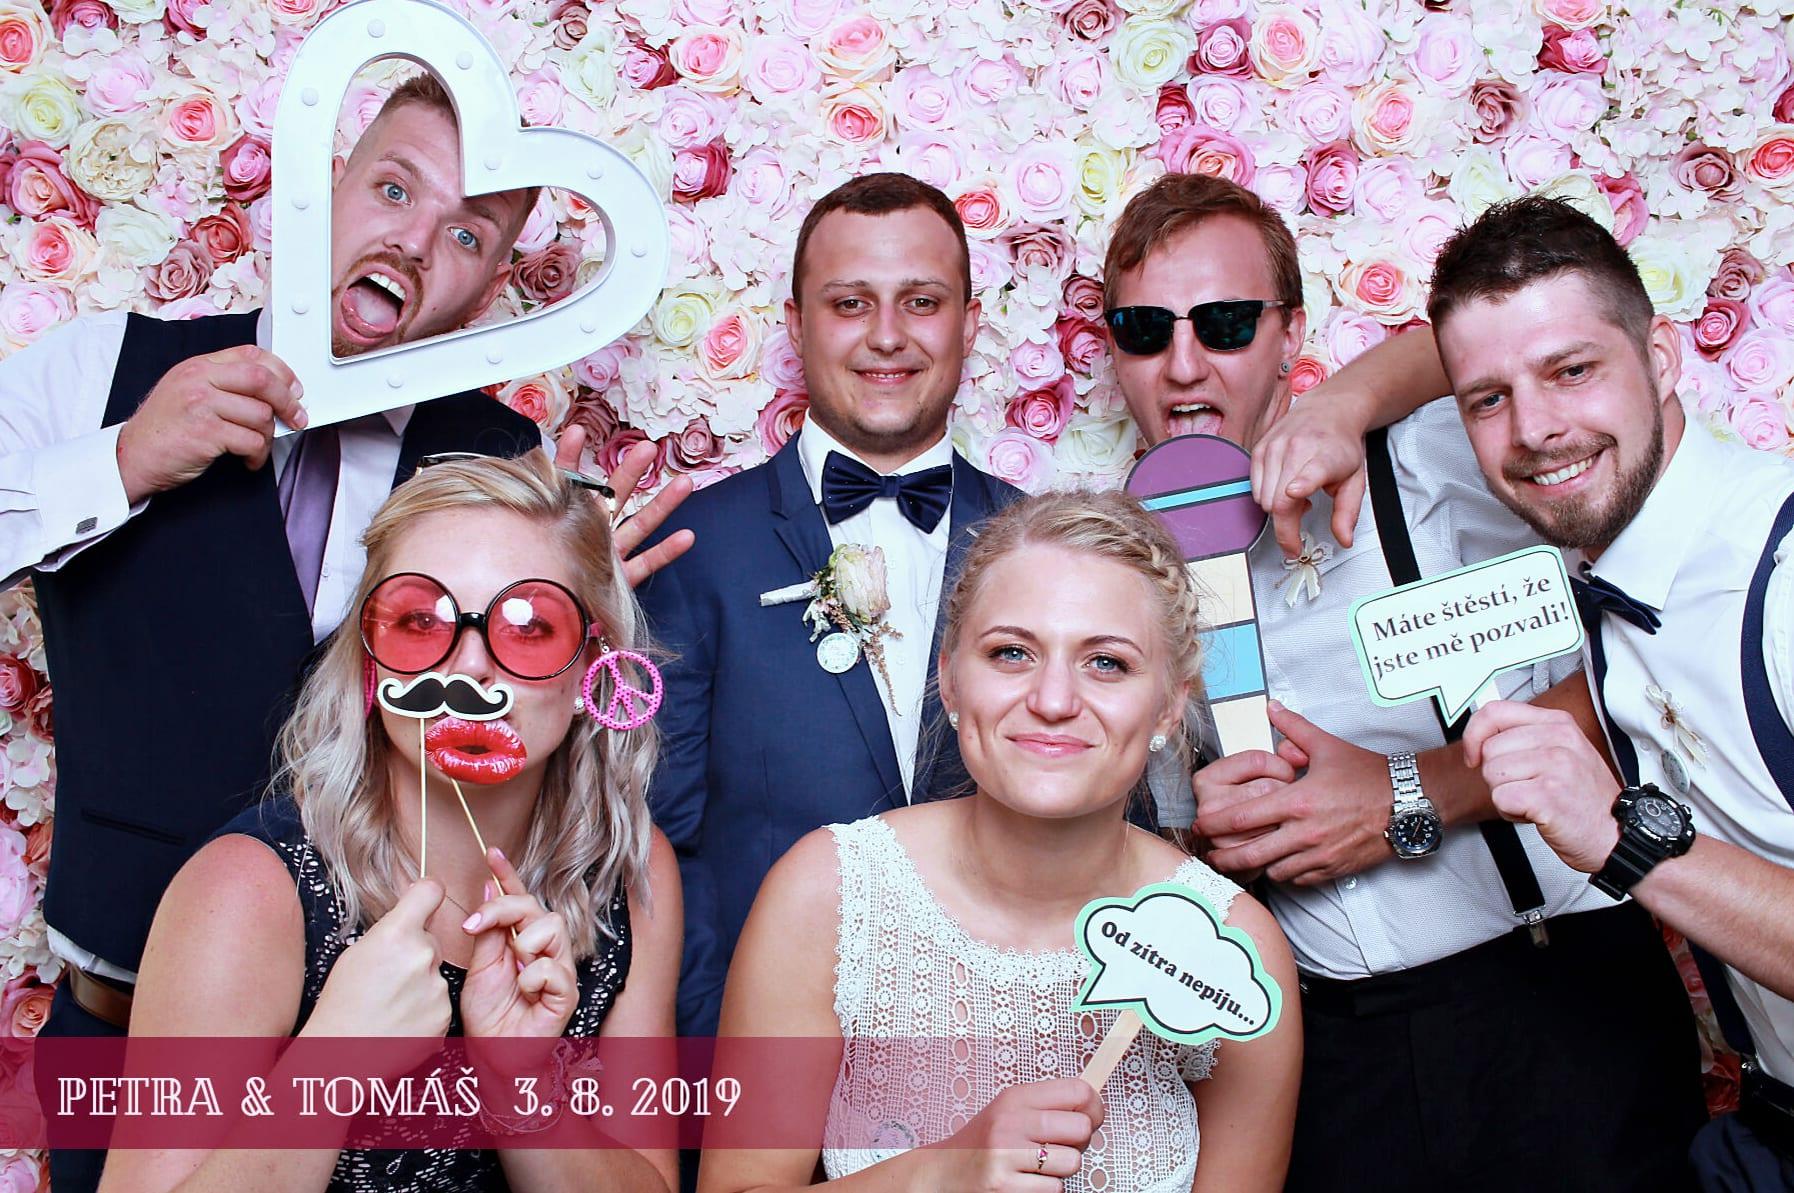 fotokoutek-praha-svatba-pt-3-8-2019-643001